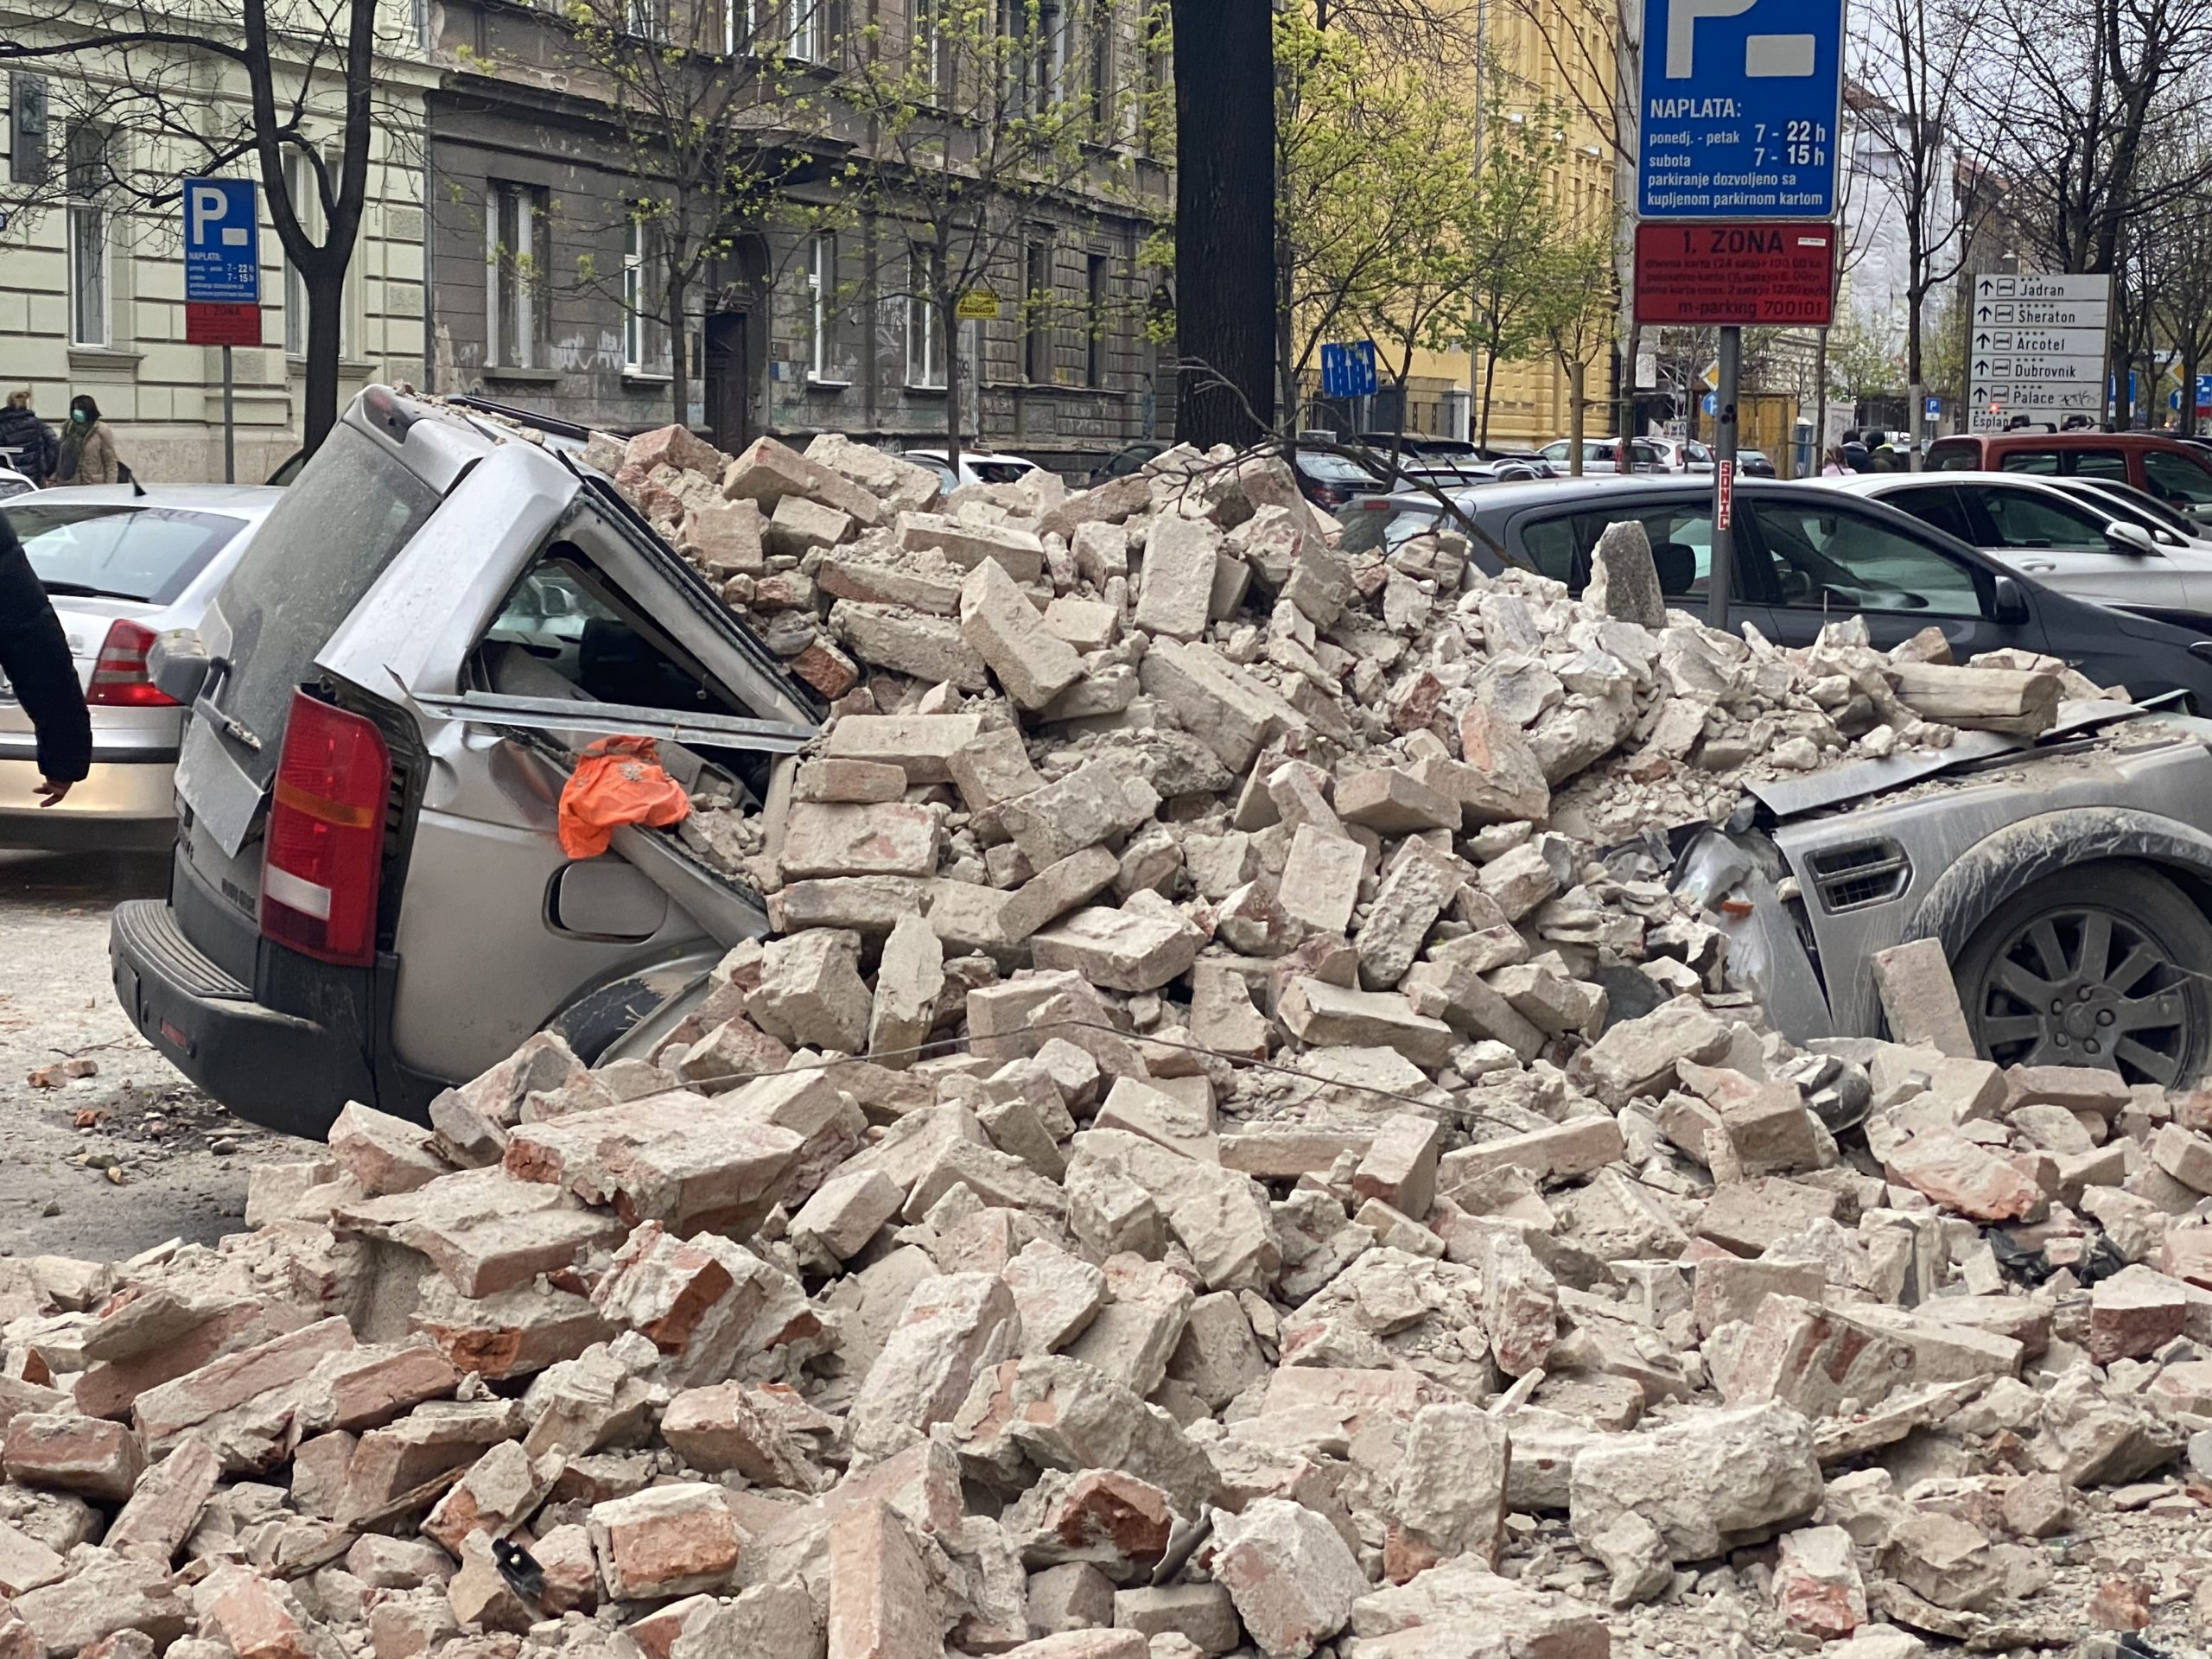 Foto Snazan Potres U Zagrebu Telegram Hr